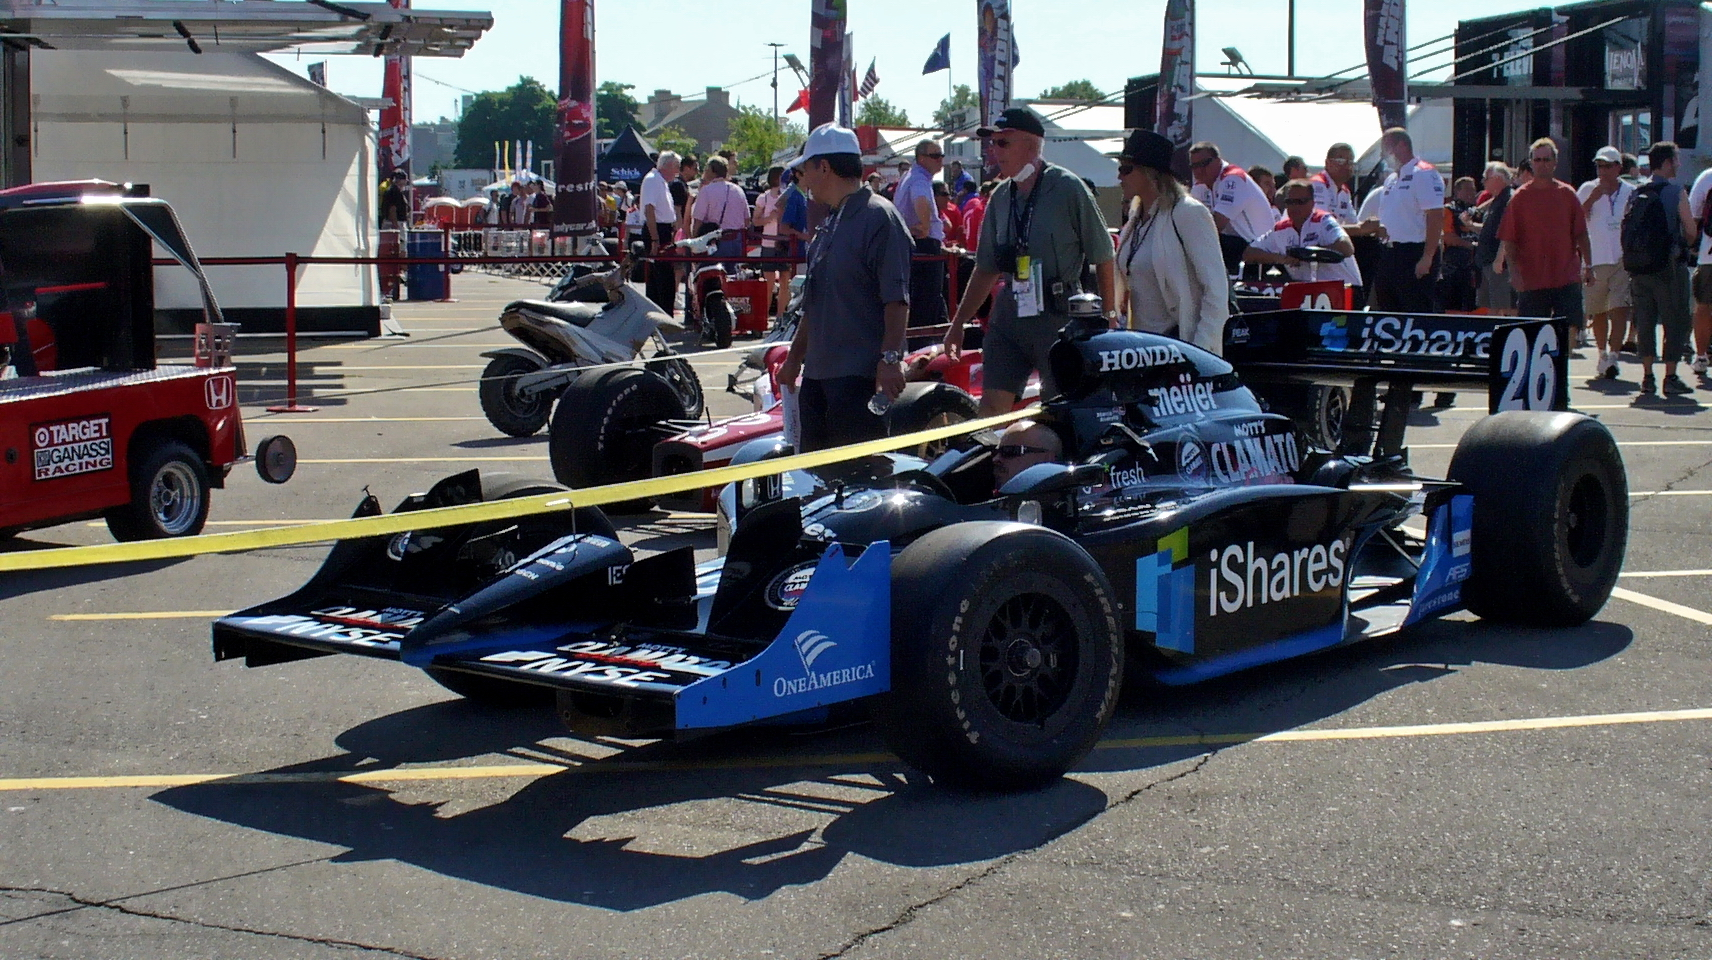 Marco Andretti's Race Car #26